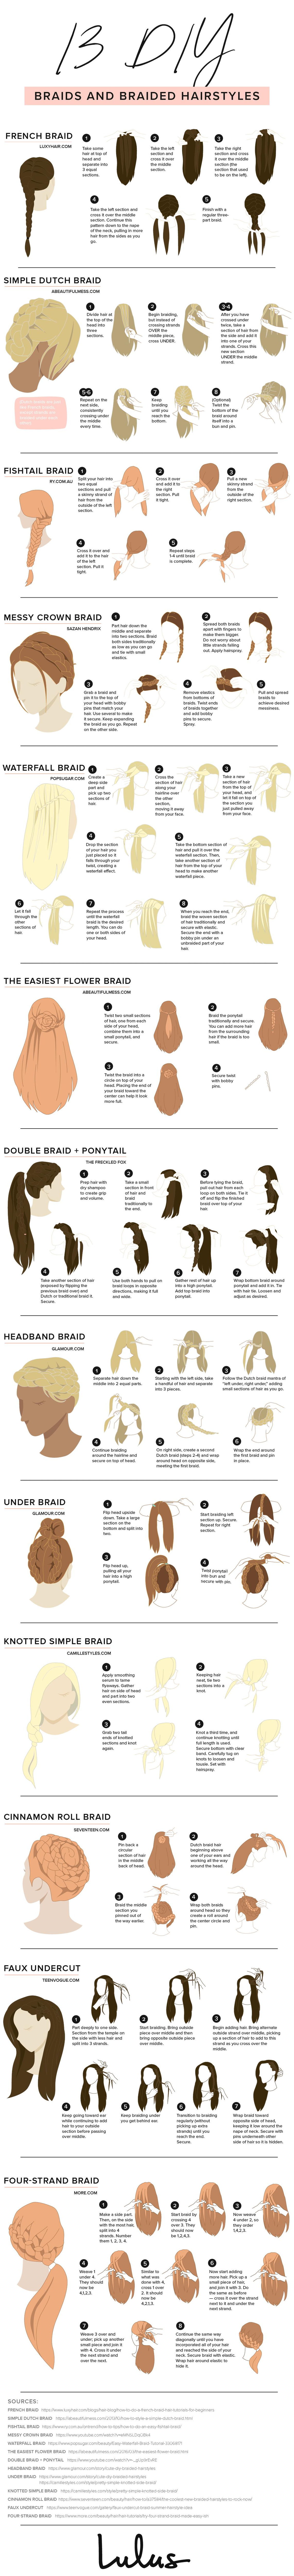 13 Diy Braids And Braided Hairstyles Lulus Com Fashion Blog